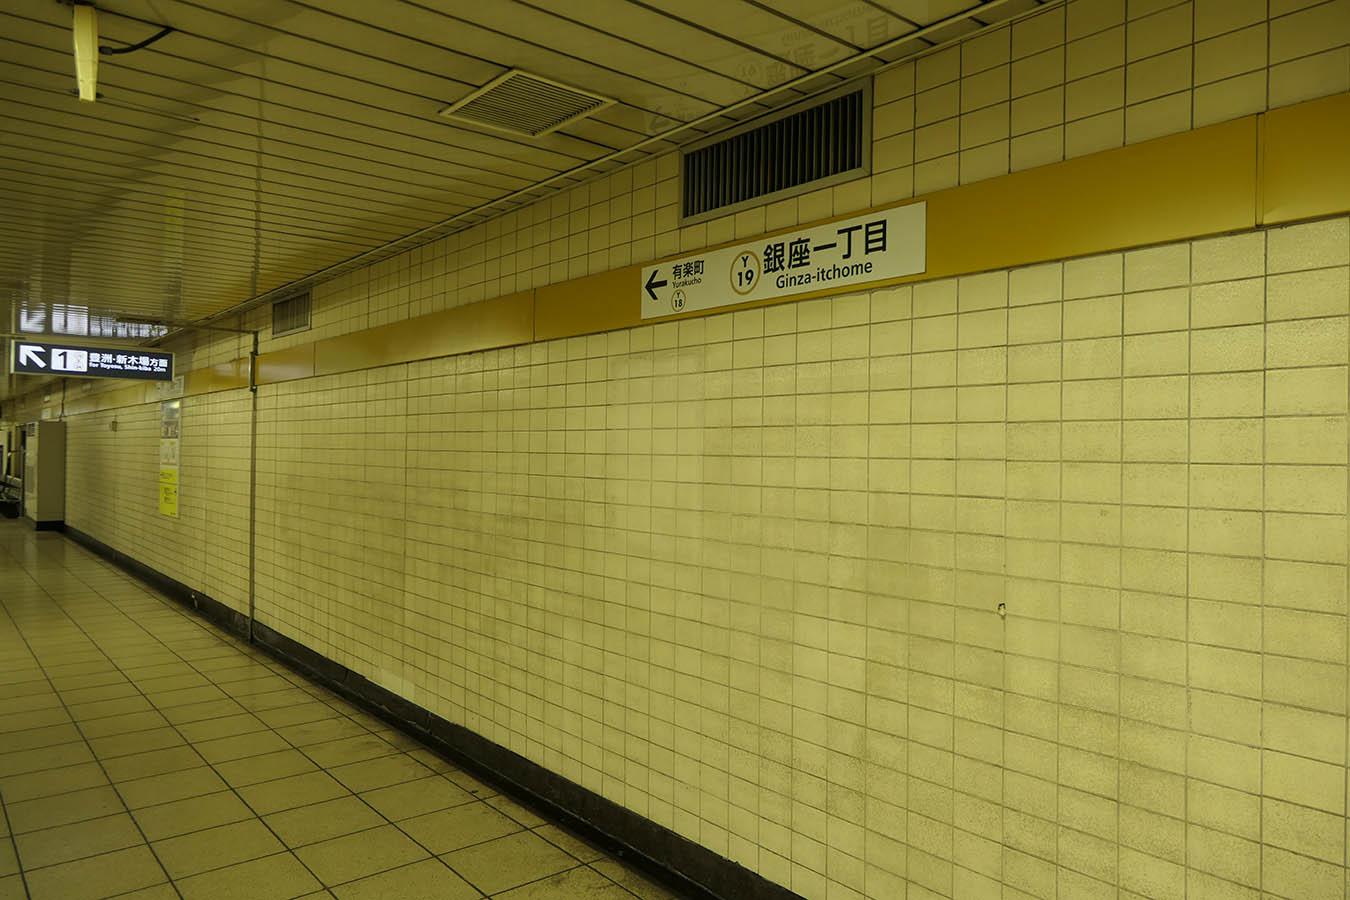 Y19_photo02.jpg